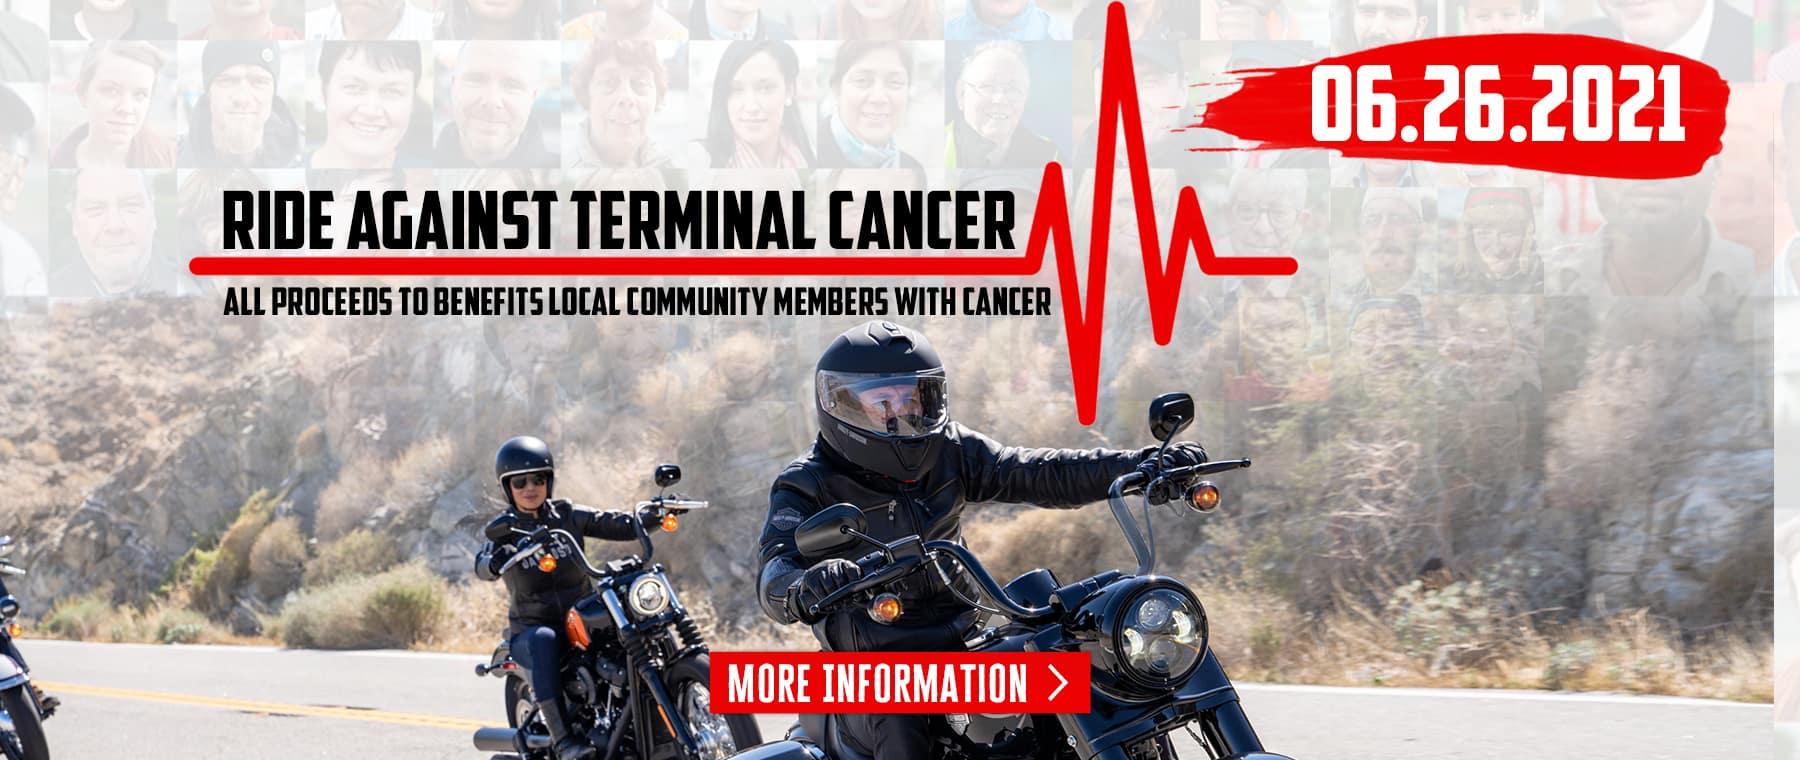 Ride Against Terminal Cancer – Web Banner